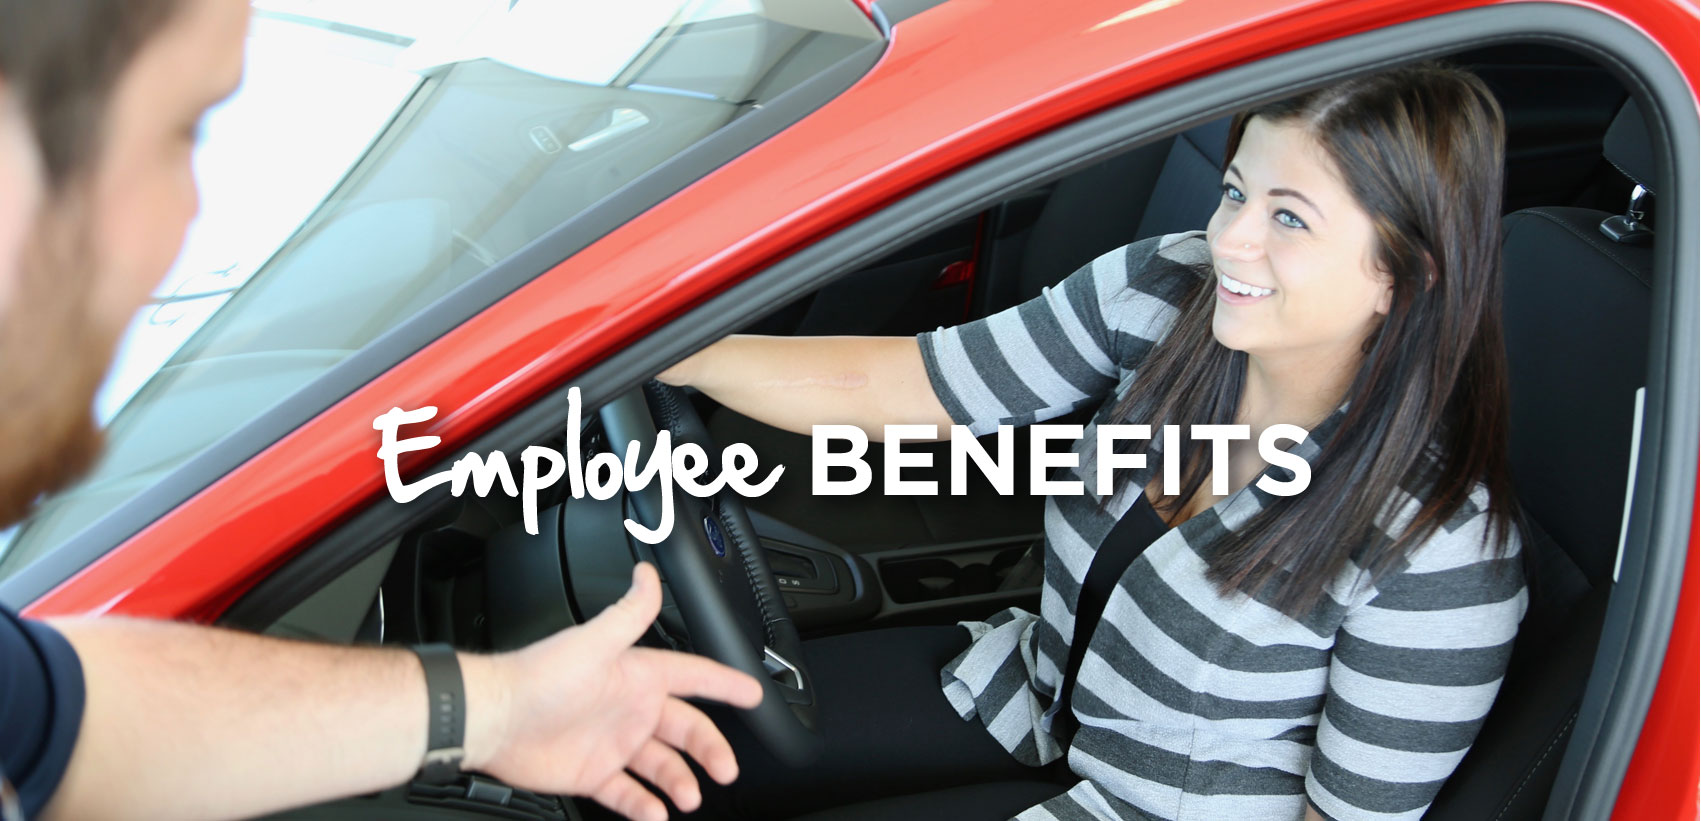 employee-benefits-header-main